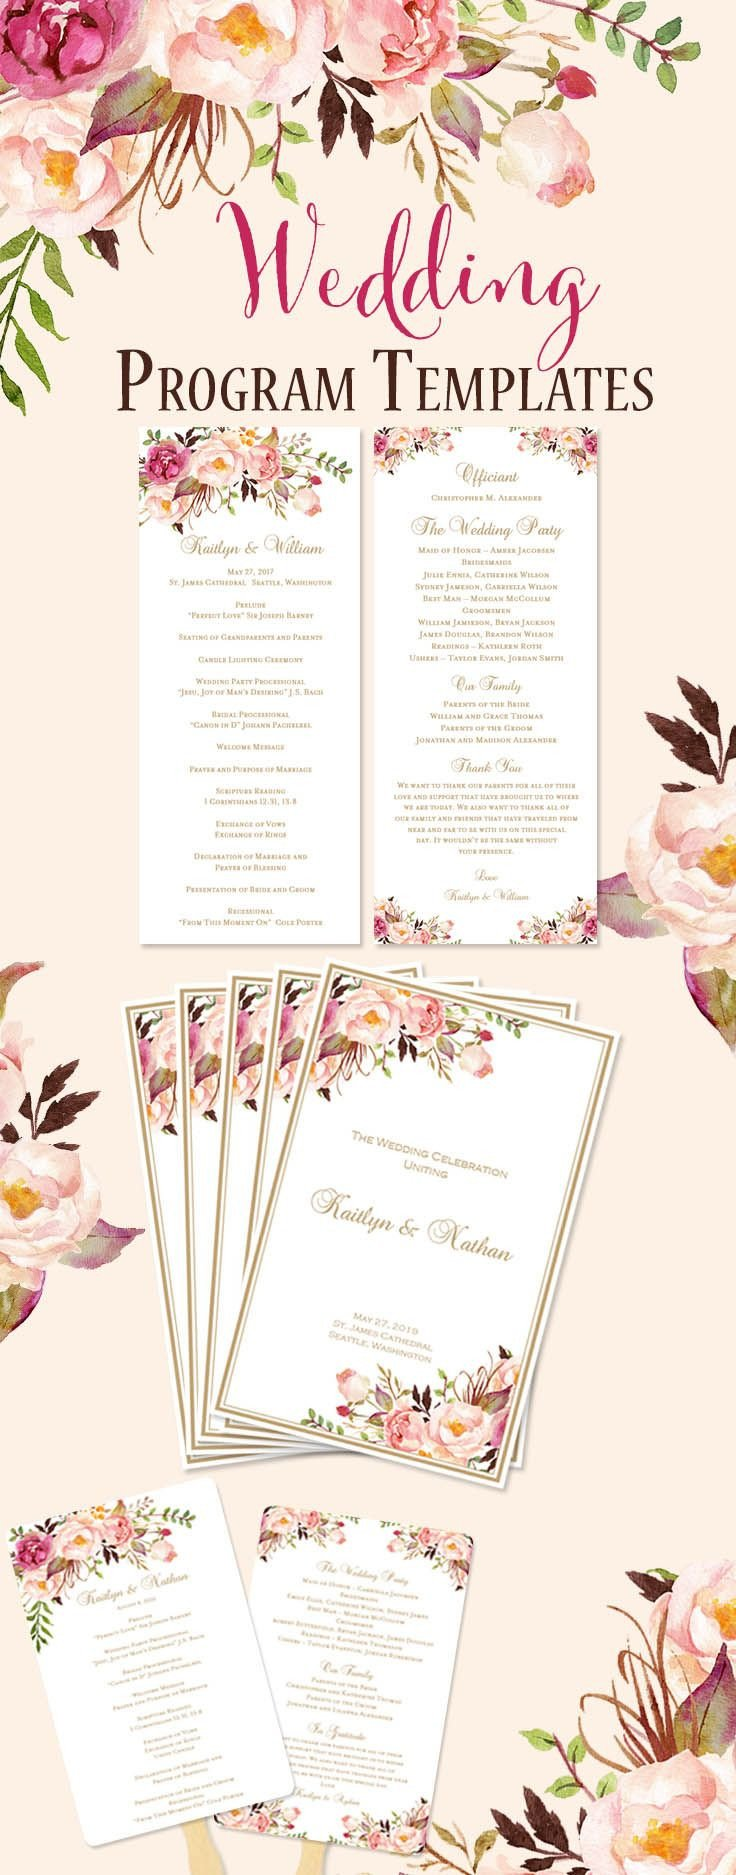 Templates for Wedding Programs Best 25 Wedding Program Templates Ideas On Pinterest